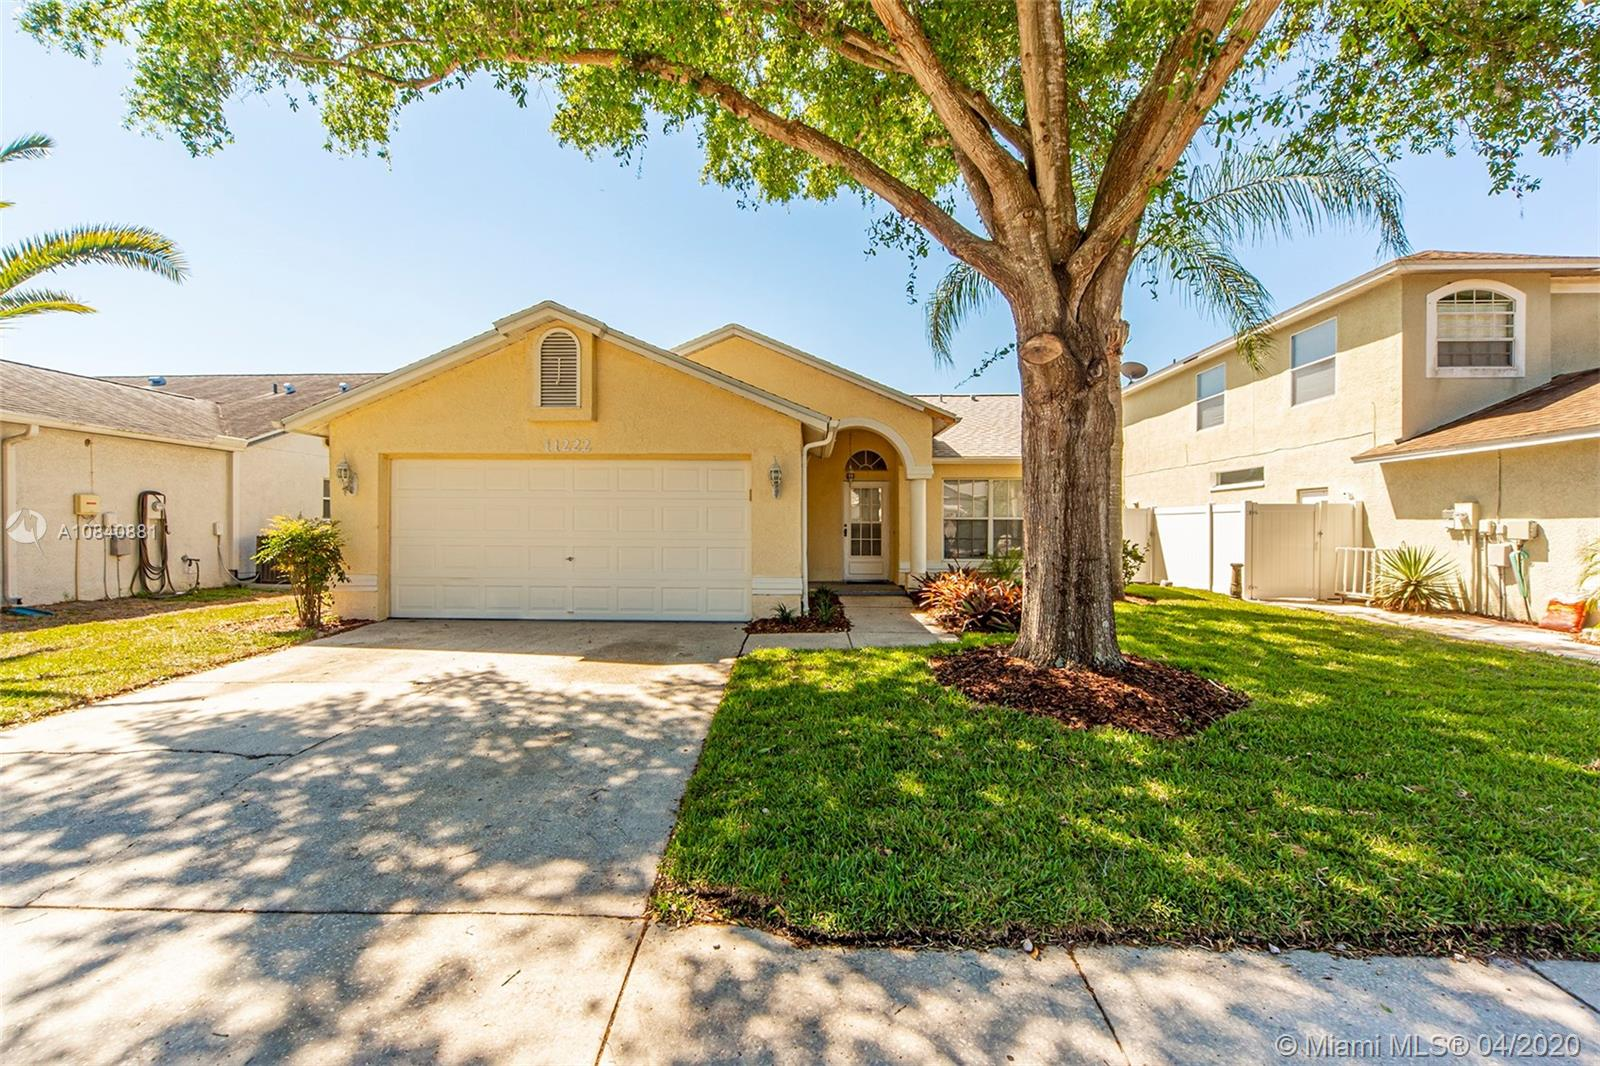 11222 N Clayridge Drive, Tampa, FL 33635